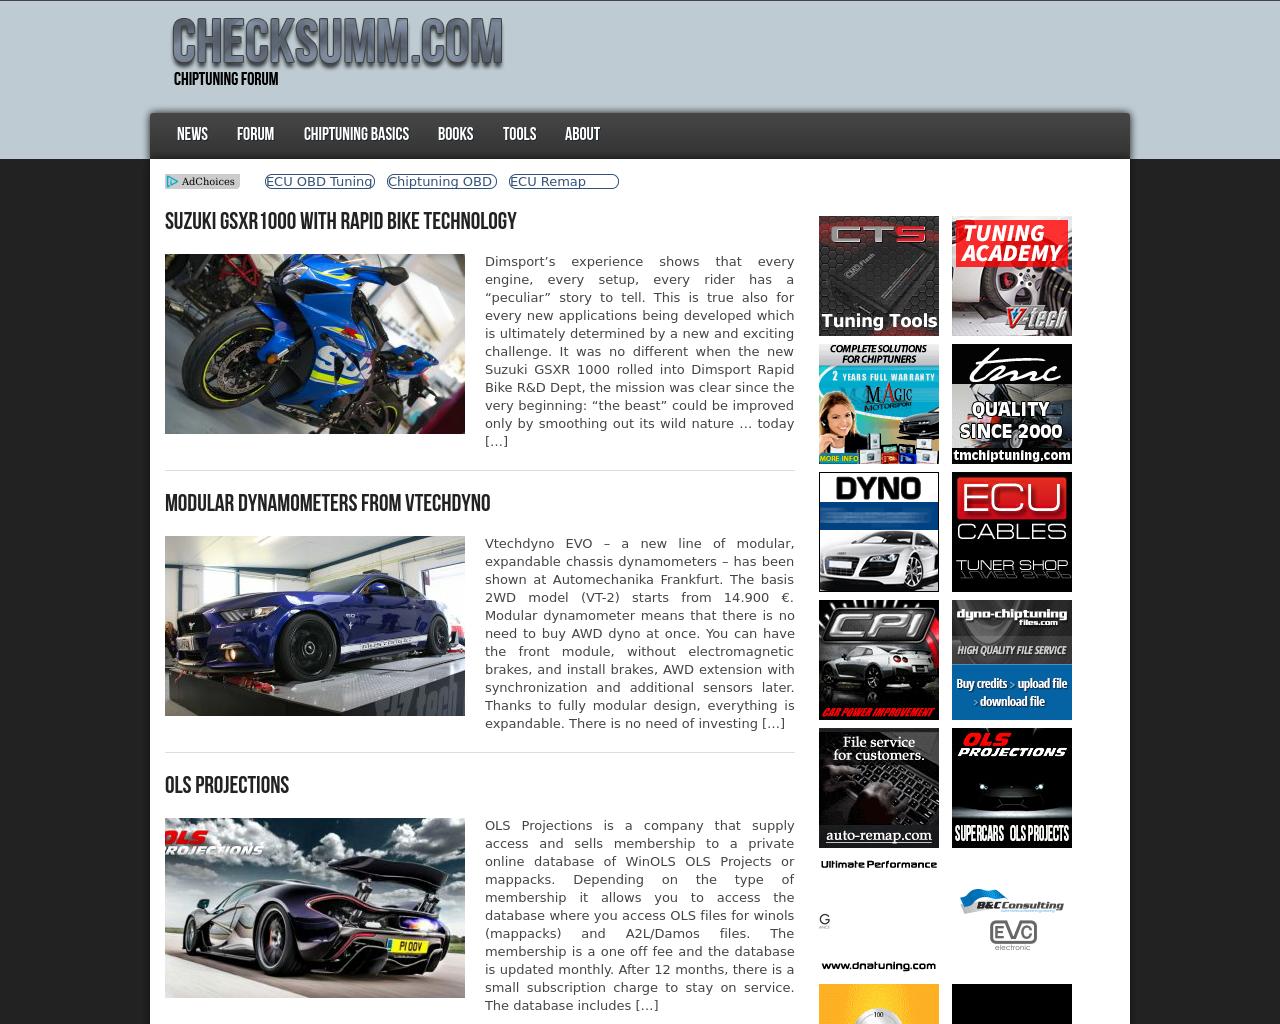 Checksumm.com-Advertising-Reviews-Pricing